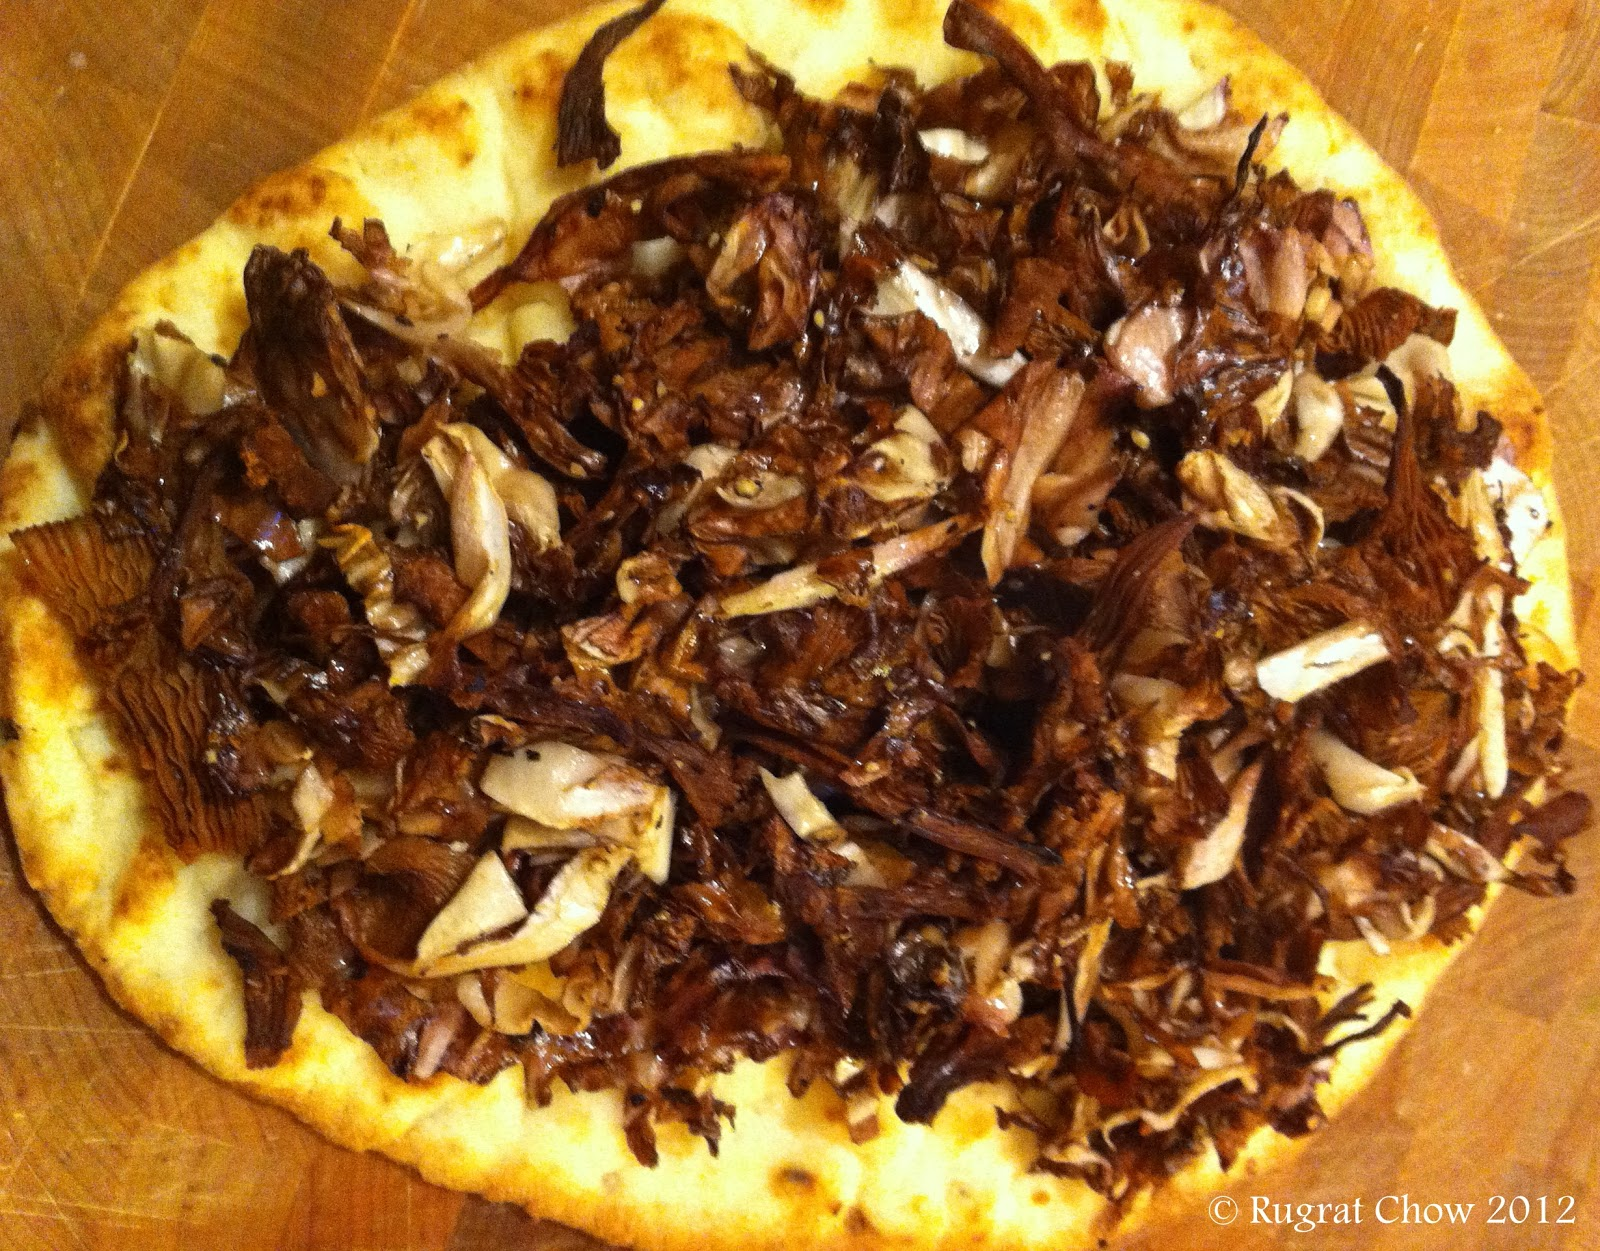 Whole Food Life ... : Radicchio & Chanterelle Mushroom Pizza